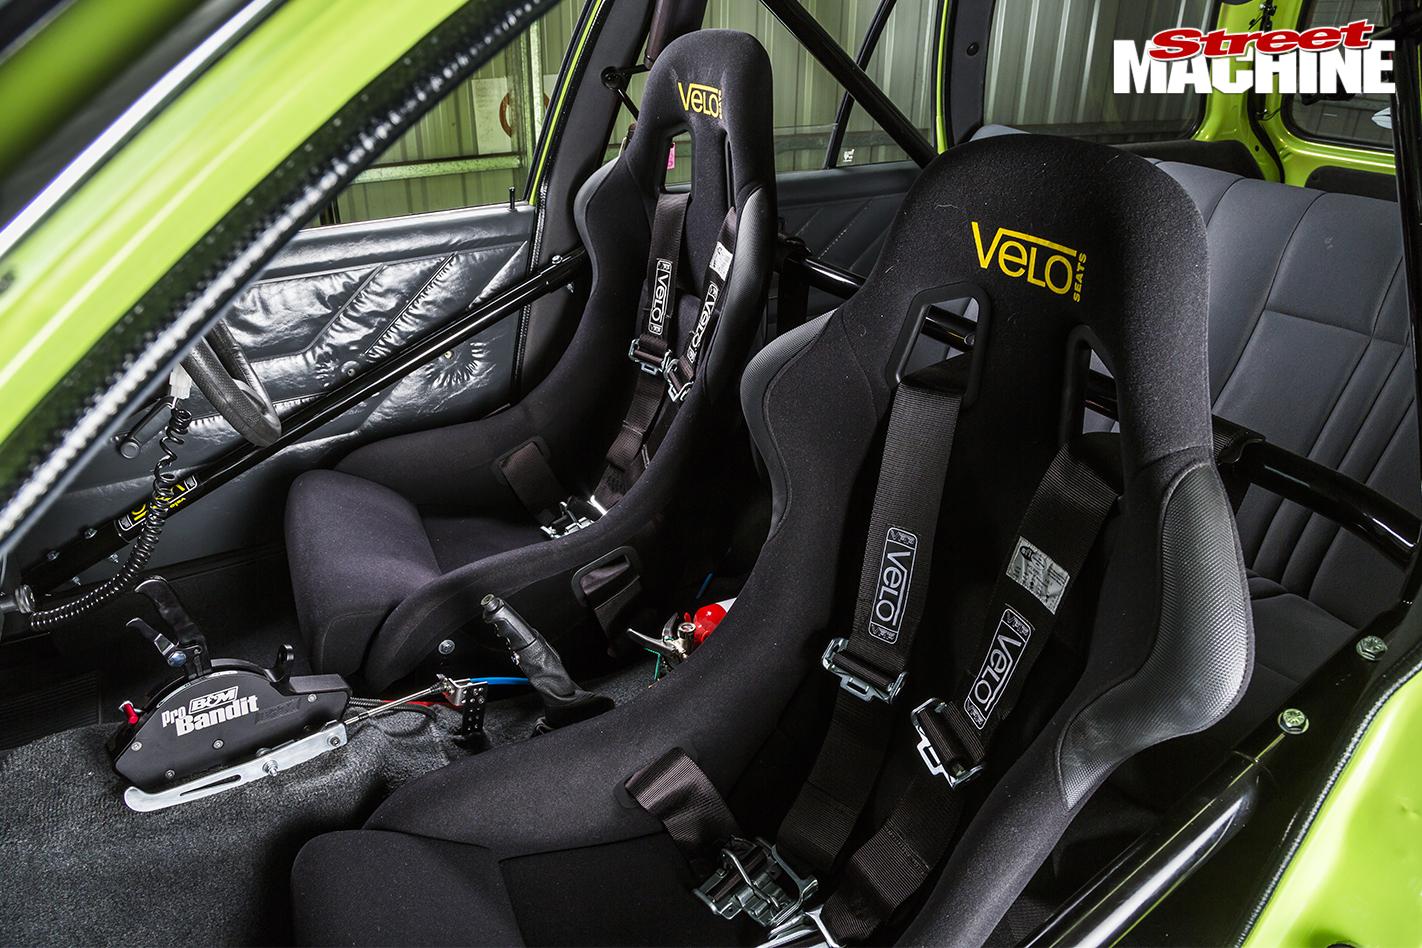 Holden -VH-Vacationer -Wagon -interior -race -seats